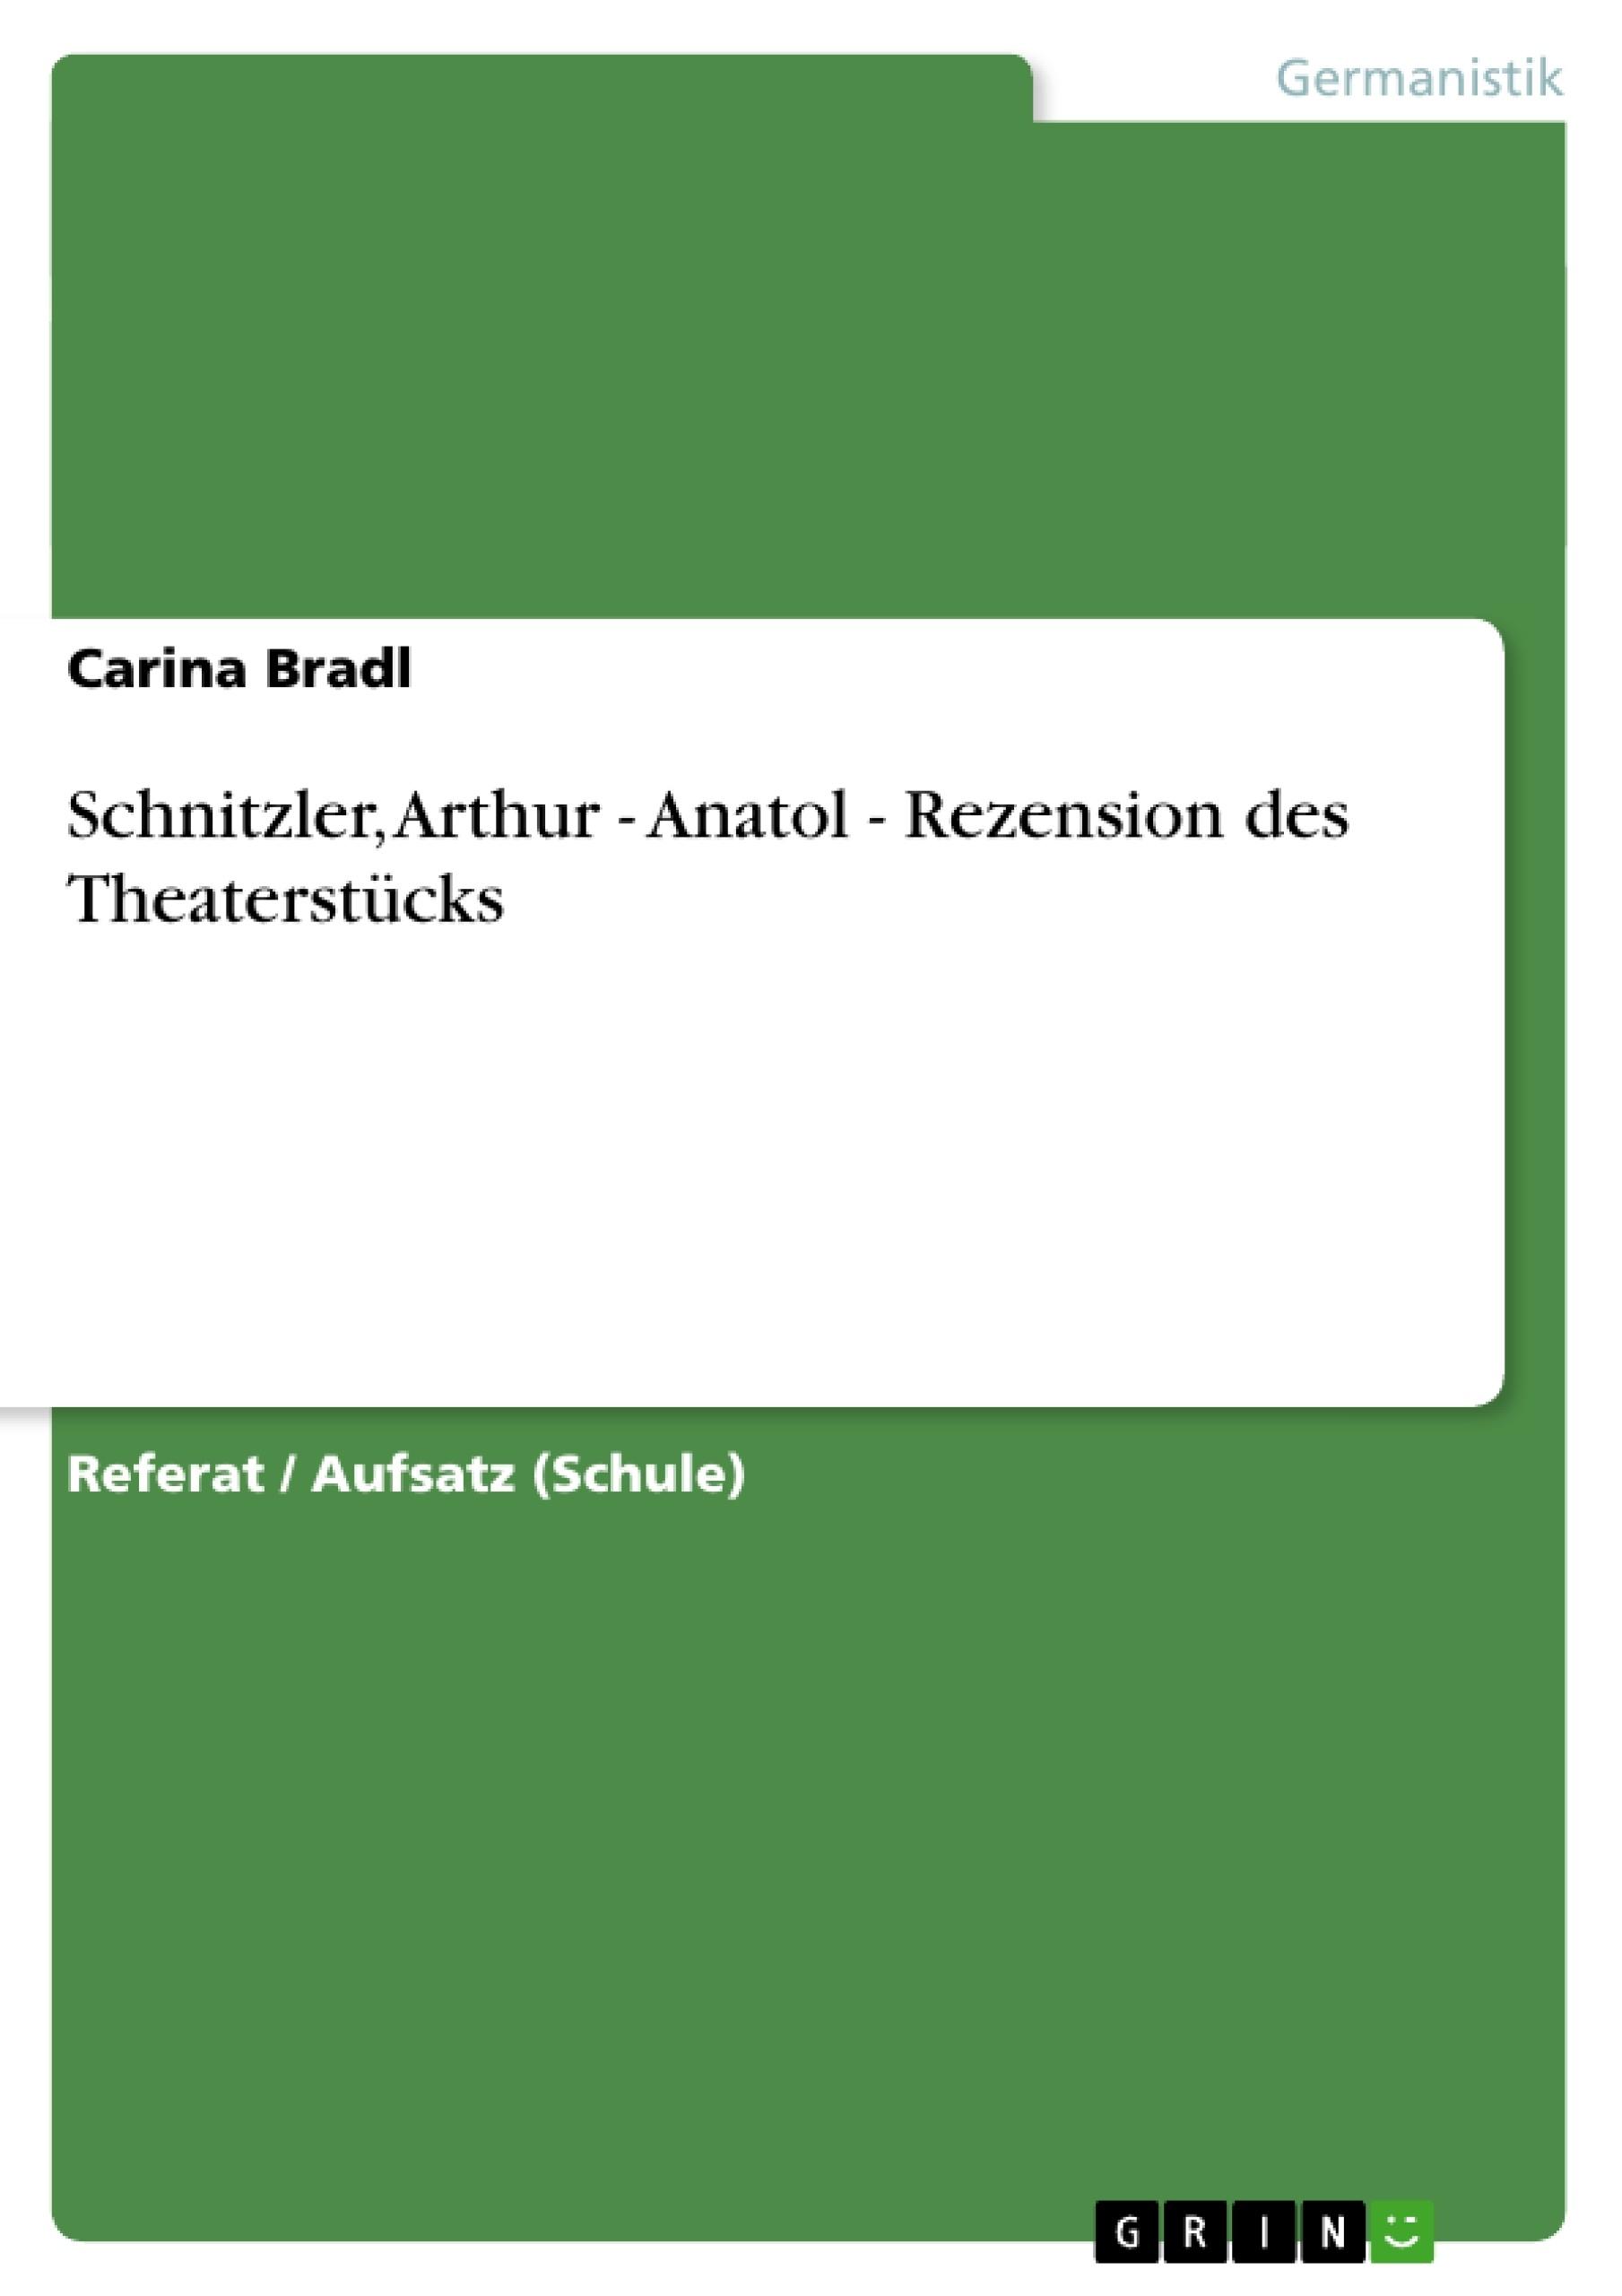 Titel: Schnitzler, Arthur - Anatol - Rezension des Theaterstücks